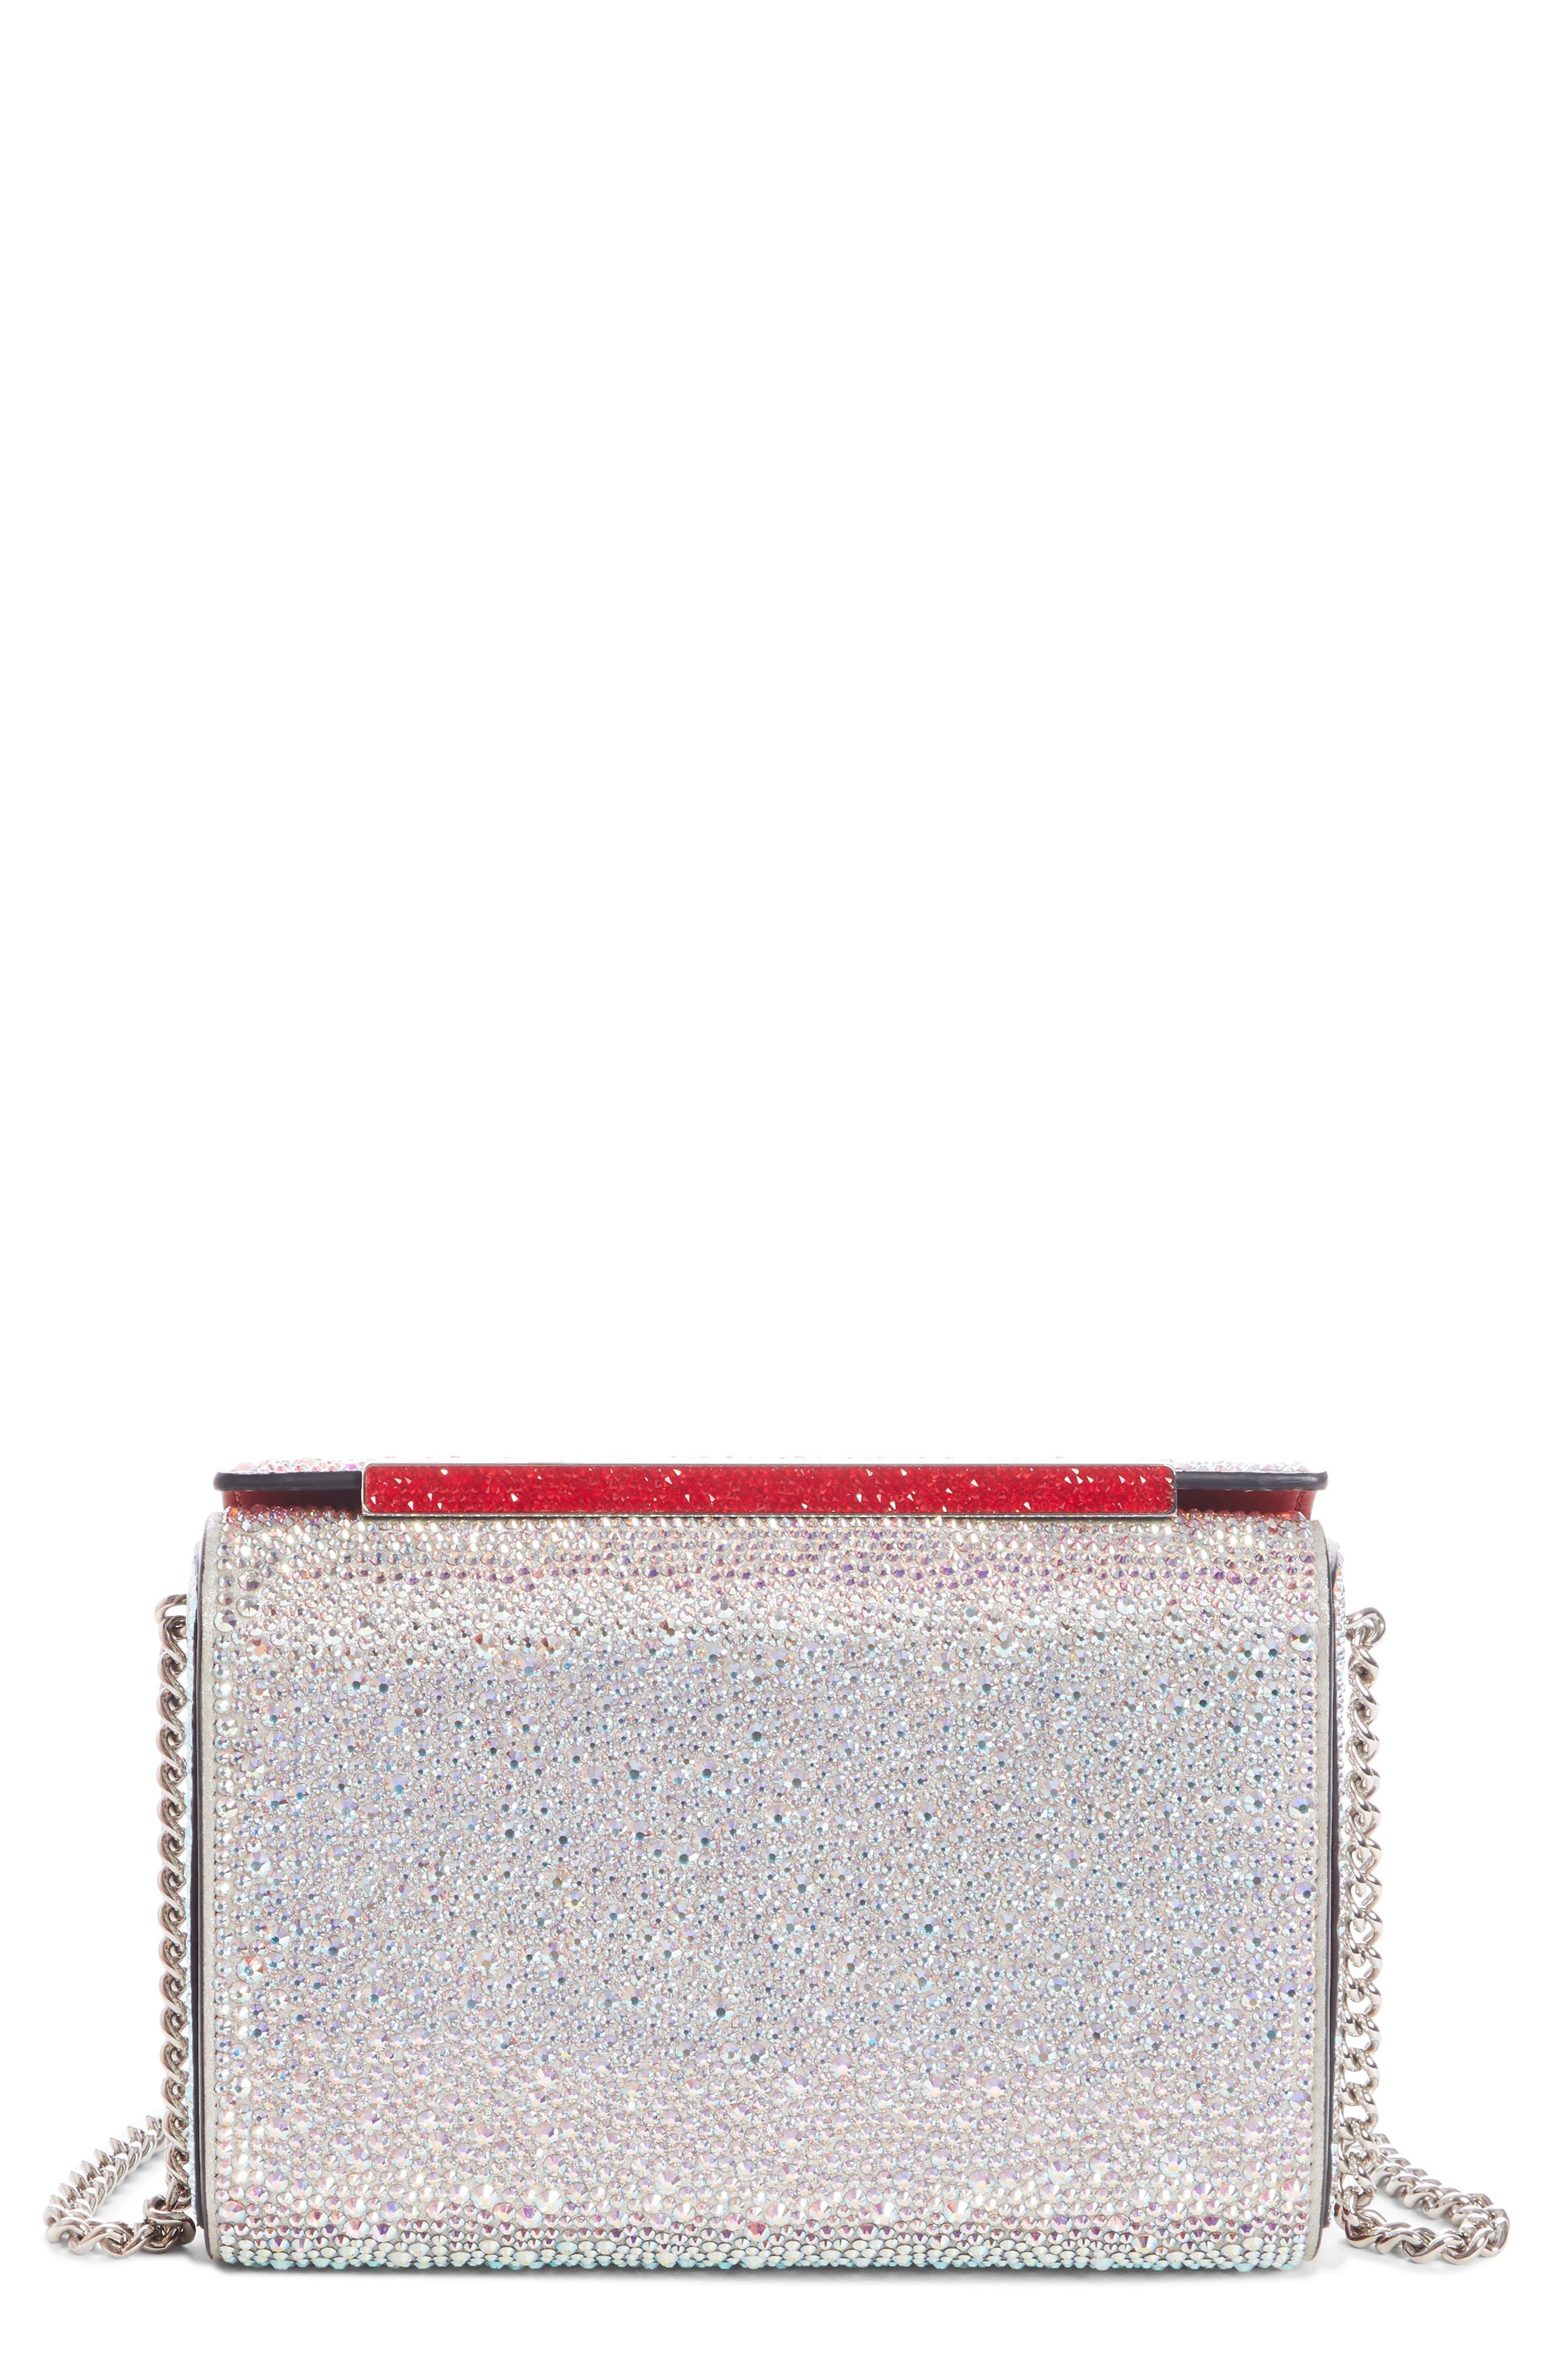 CHRISTIAN LOUBOUTIN Large Vanite Crystal Embellished Clutch, Main, color, 045